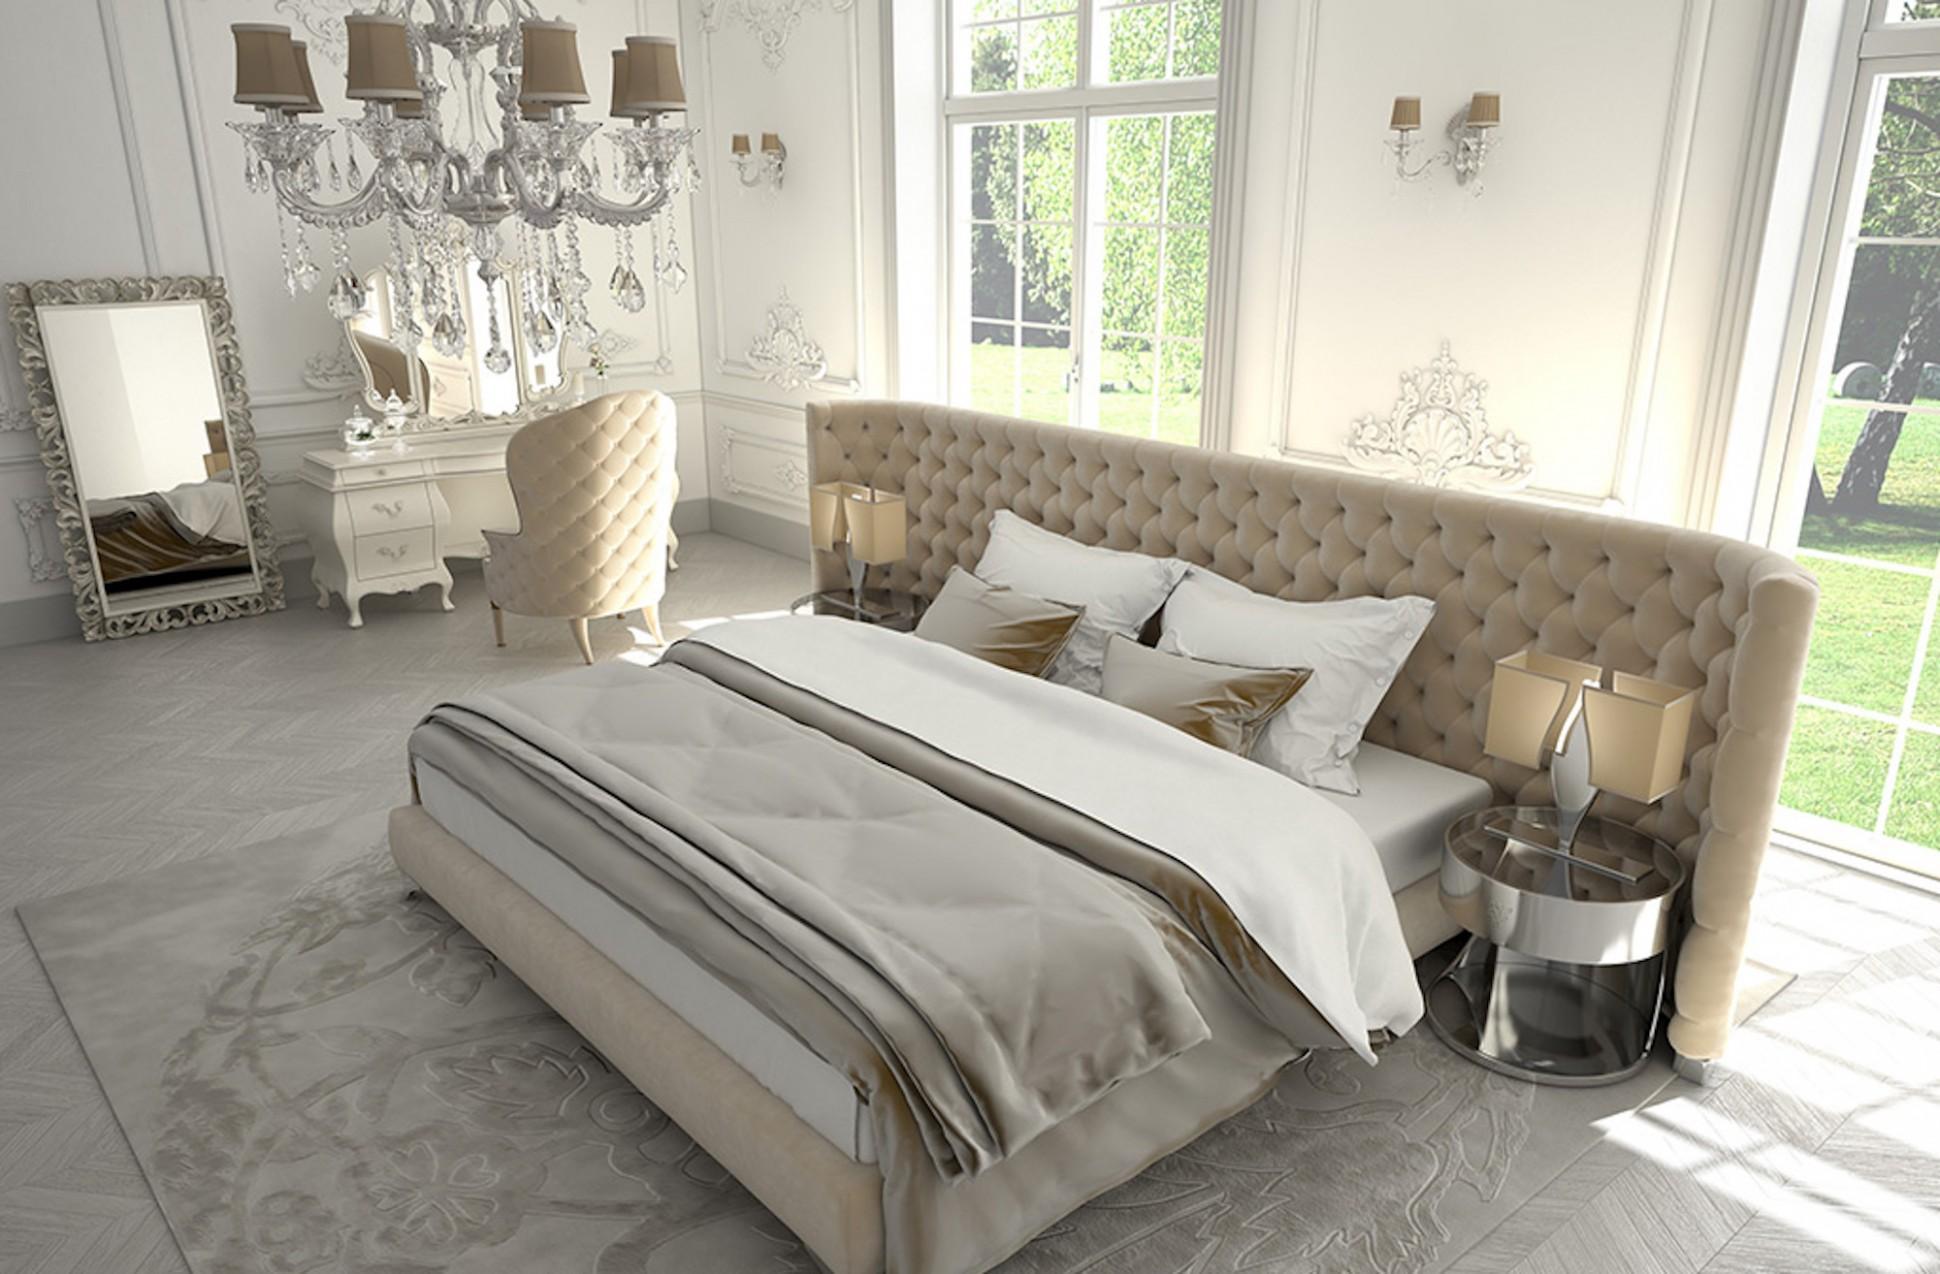 12 Luxurious Bedroom Decor Ideas For Your Home  Interior - Bedroom Ideas Luxury